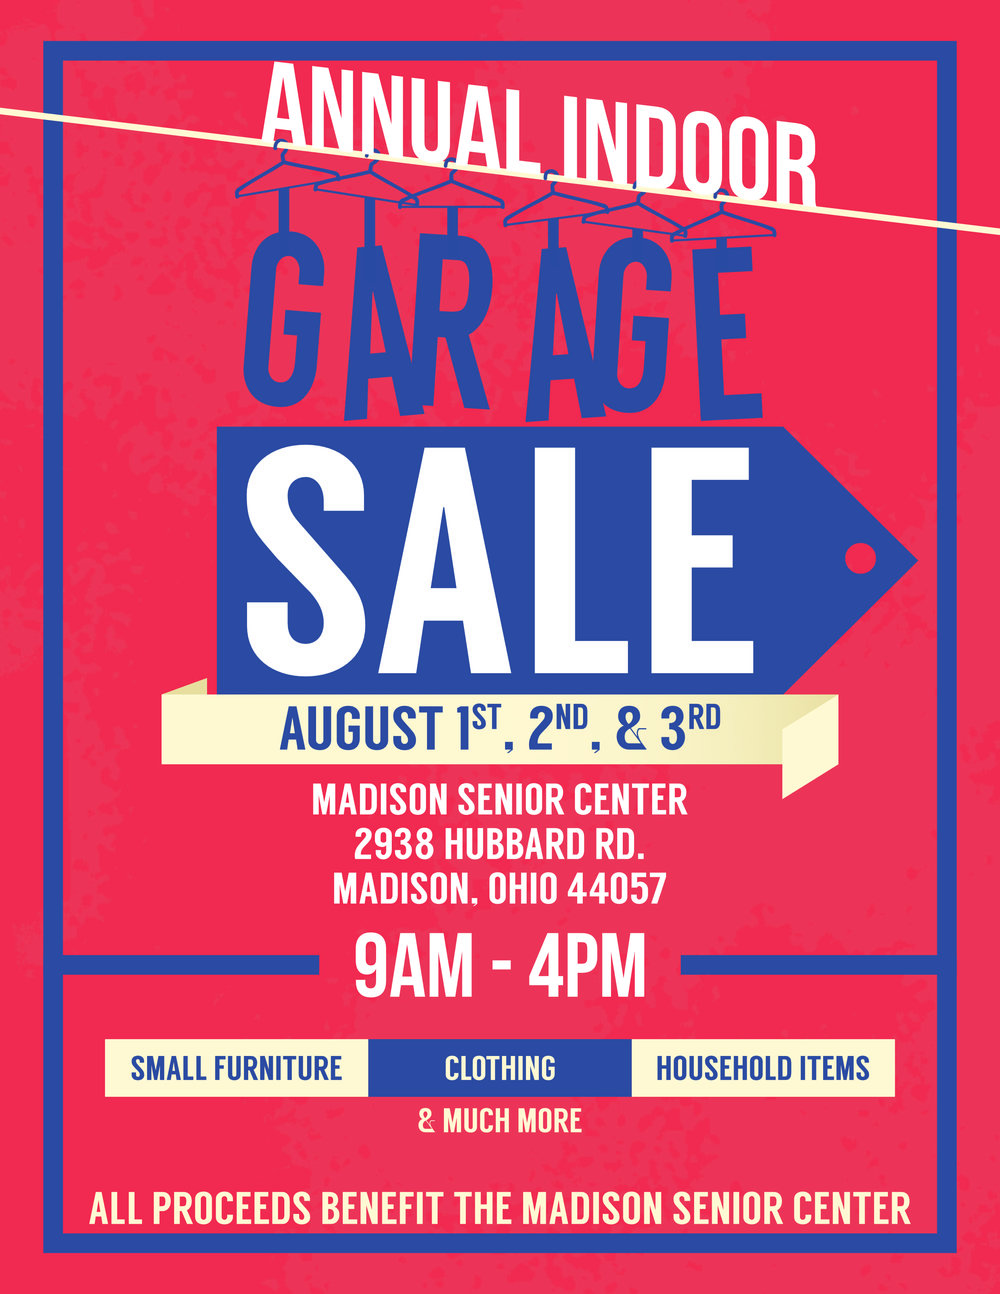 Madison Senior Center Garage Sale Flyer.jpg